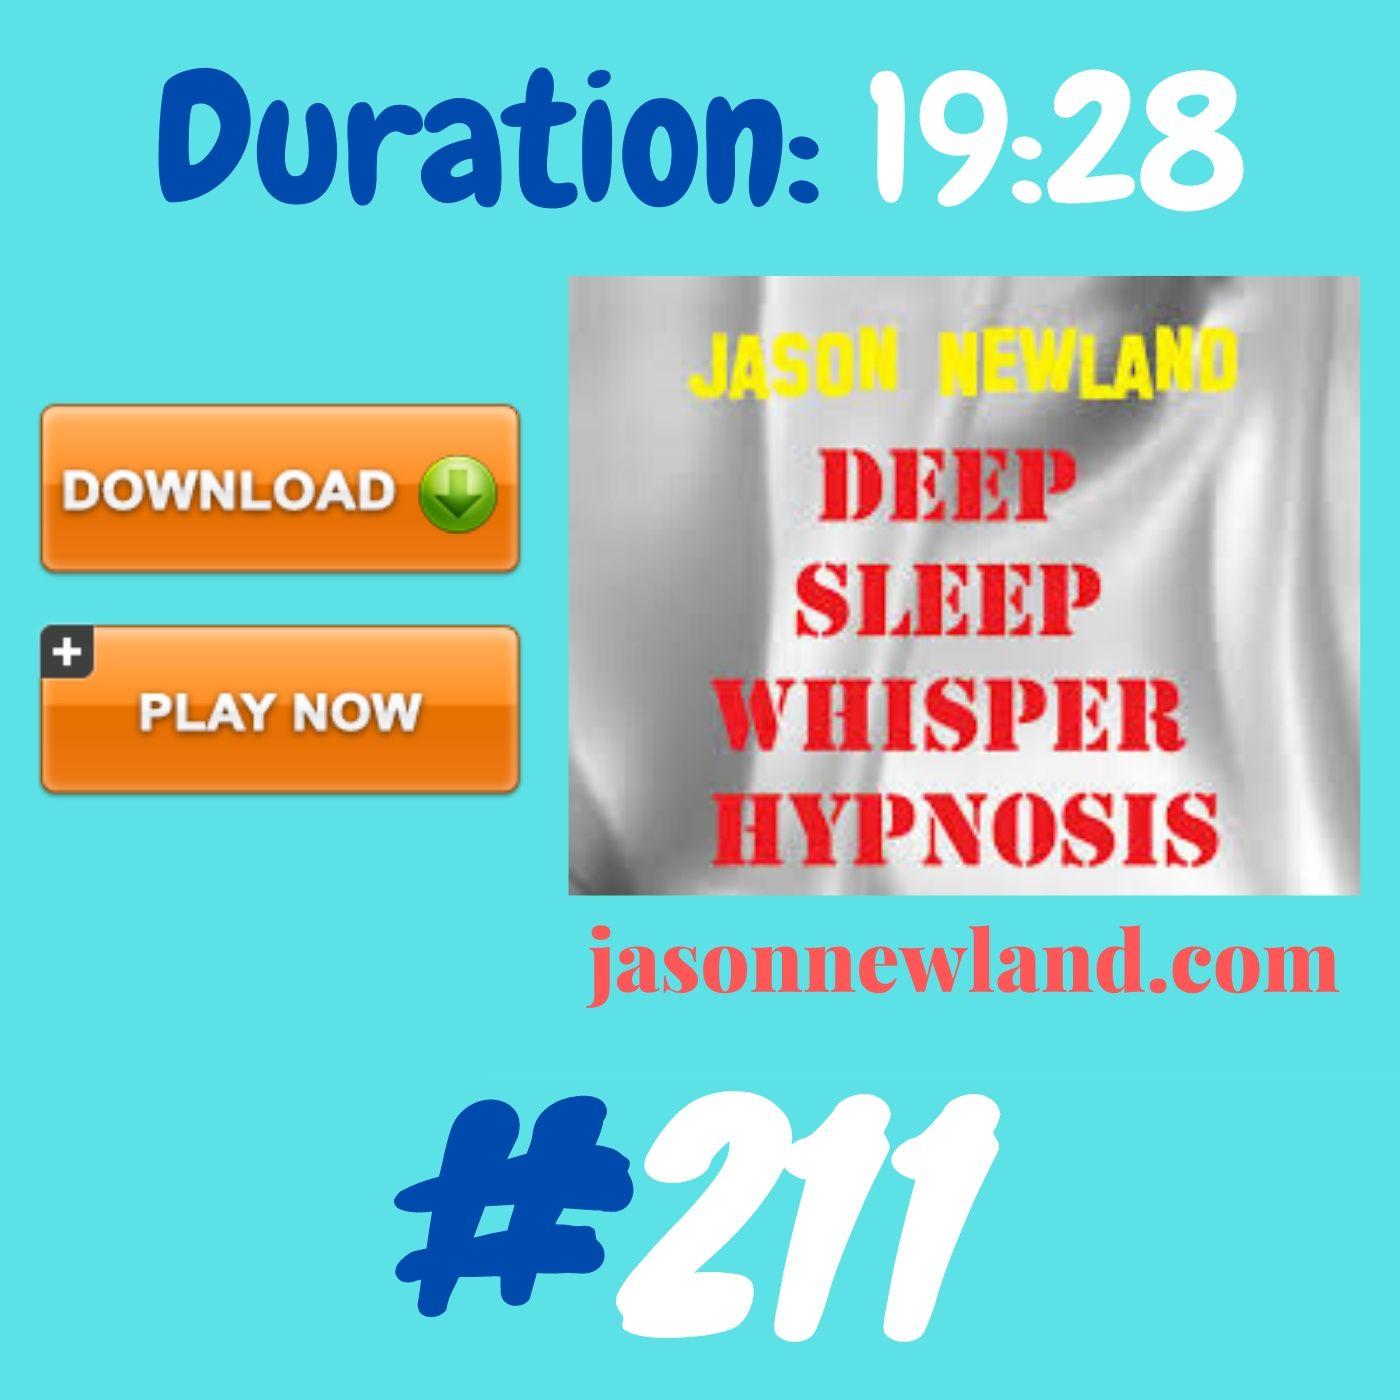 #356 Deep Sleep Whisper Hypnosis (Jason Newland) with MUSIC